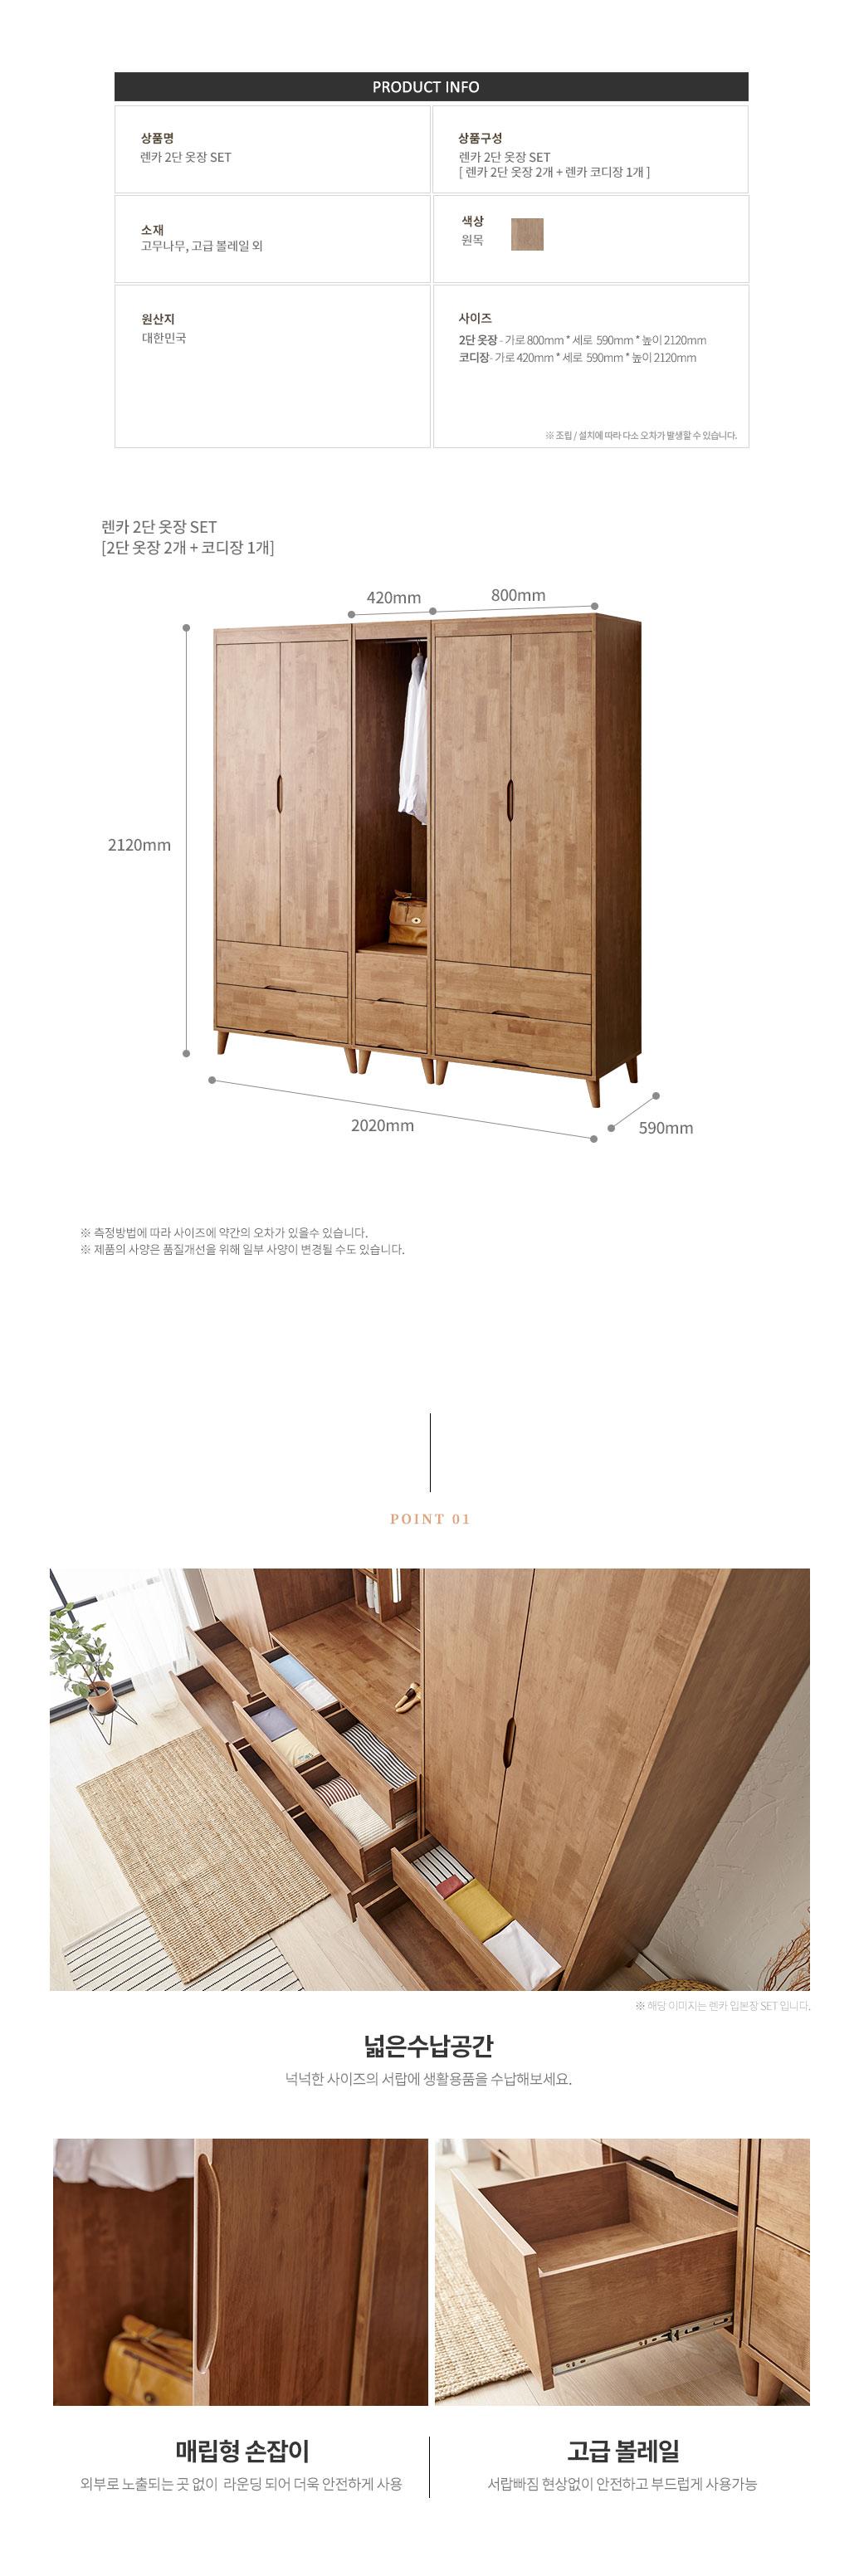 renca_closet_02.jpg